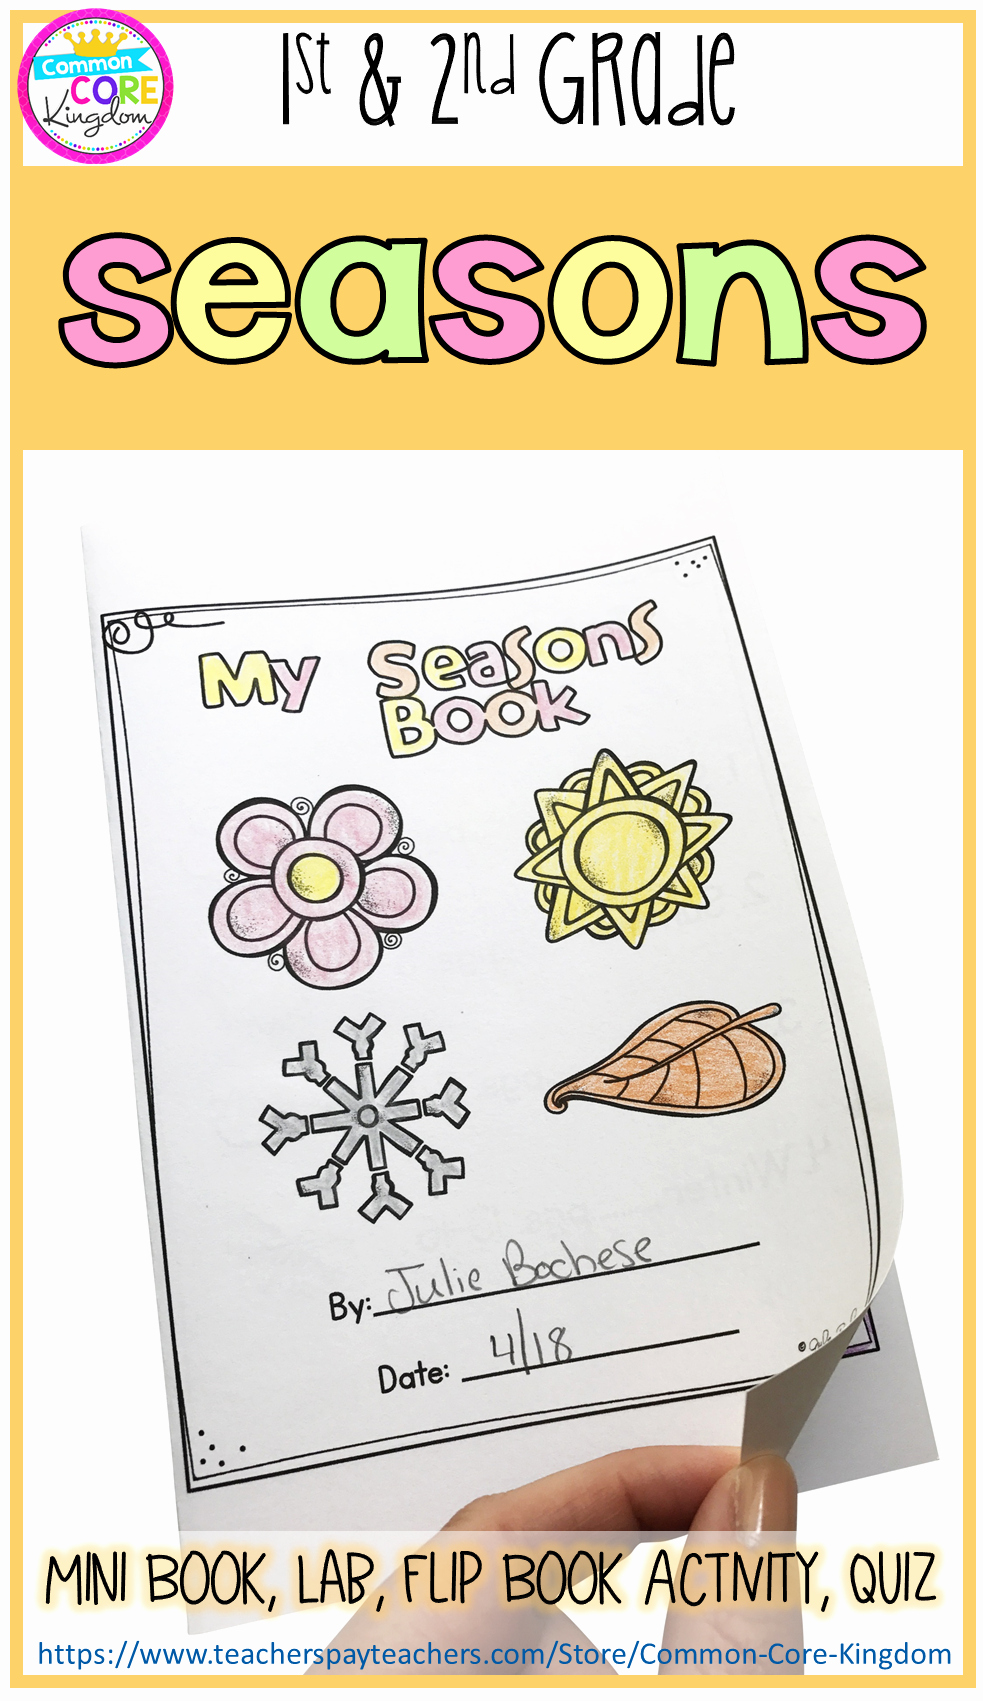 Seasons Worksheets for First Grade Beautiful Seasons Mini Unit 1st & 2nd Grade